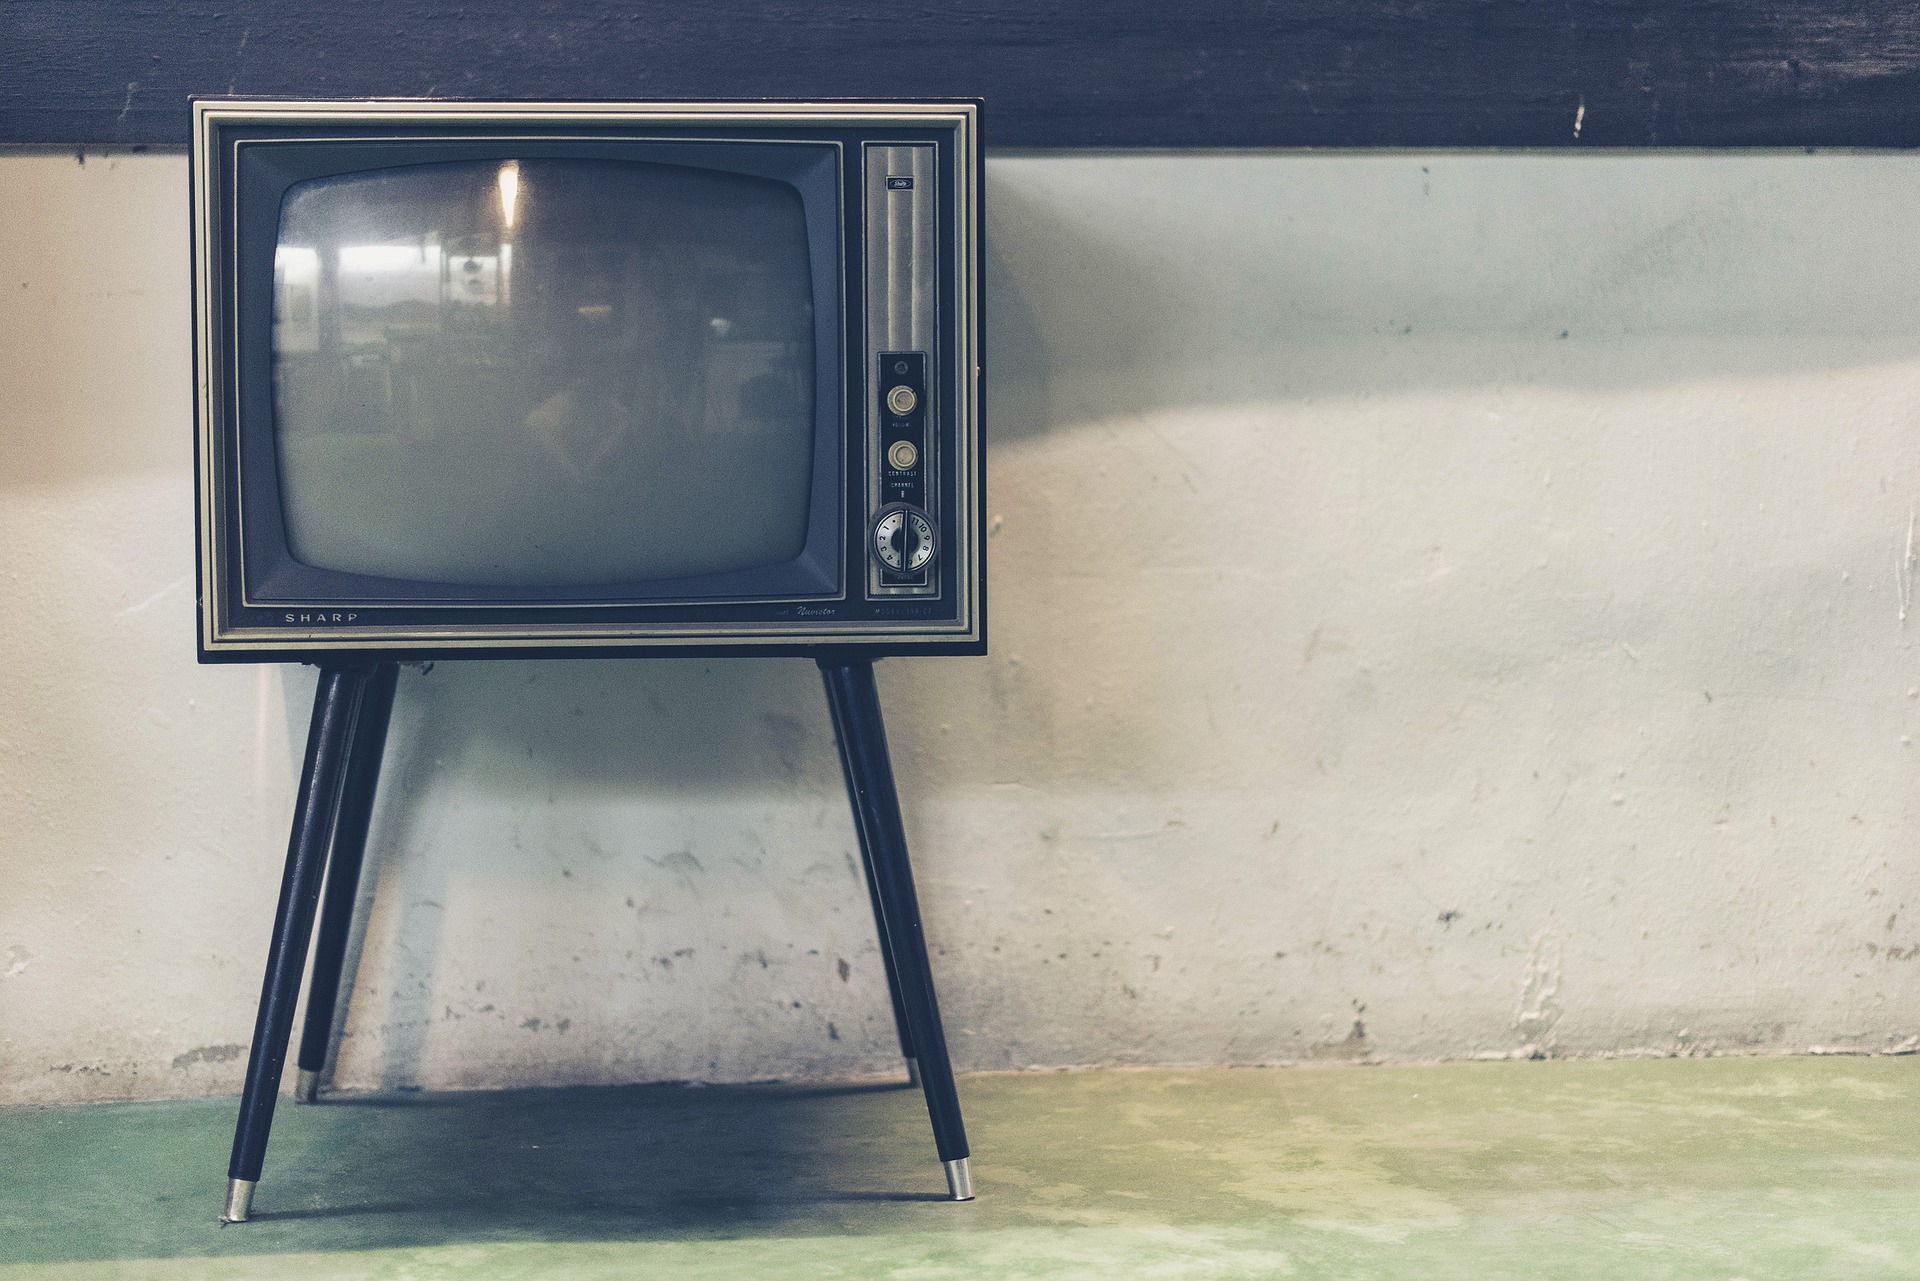 tv-1844964_1920